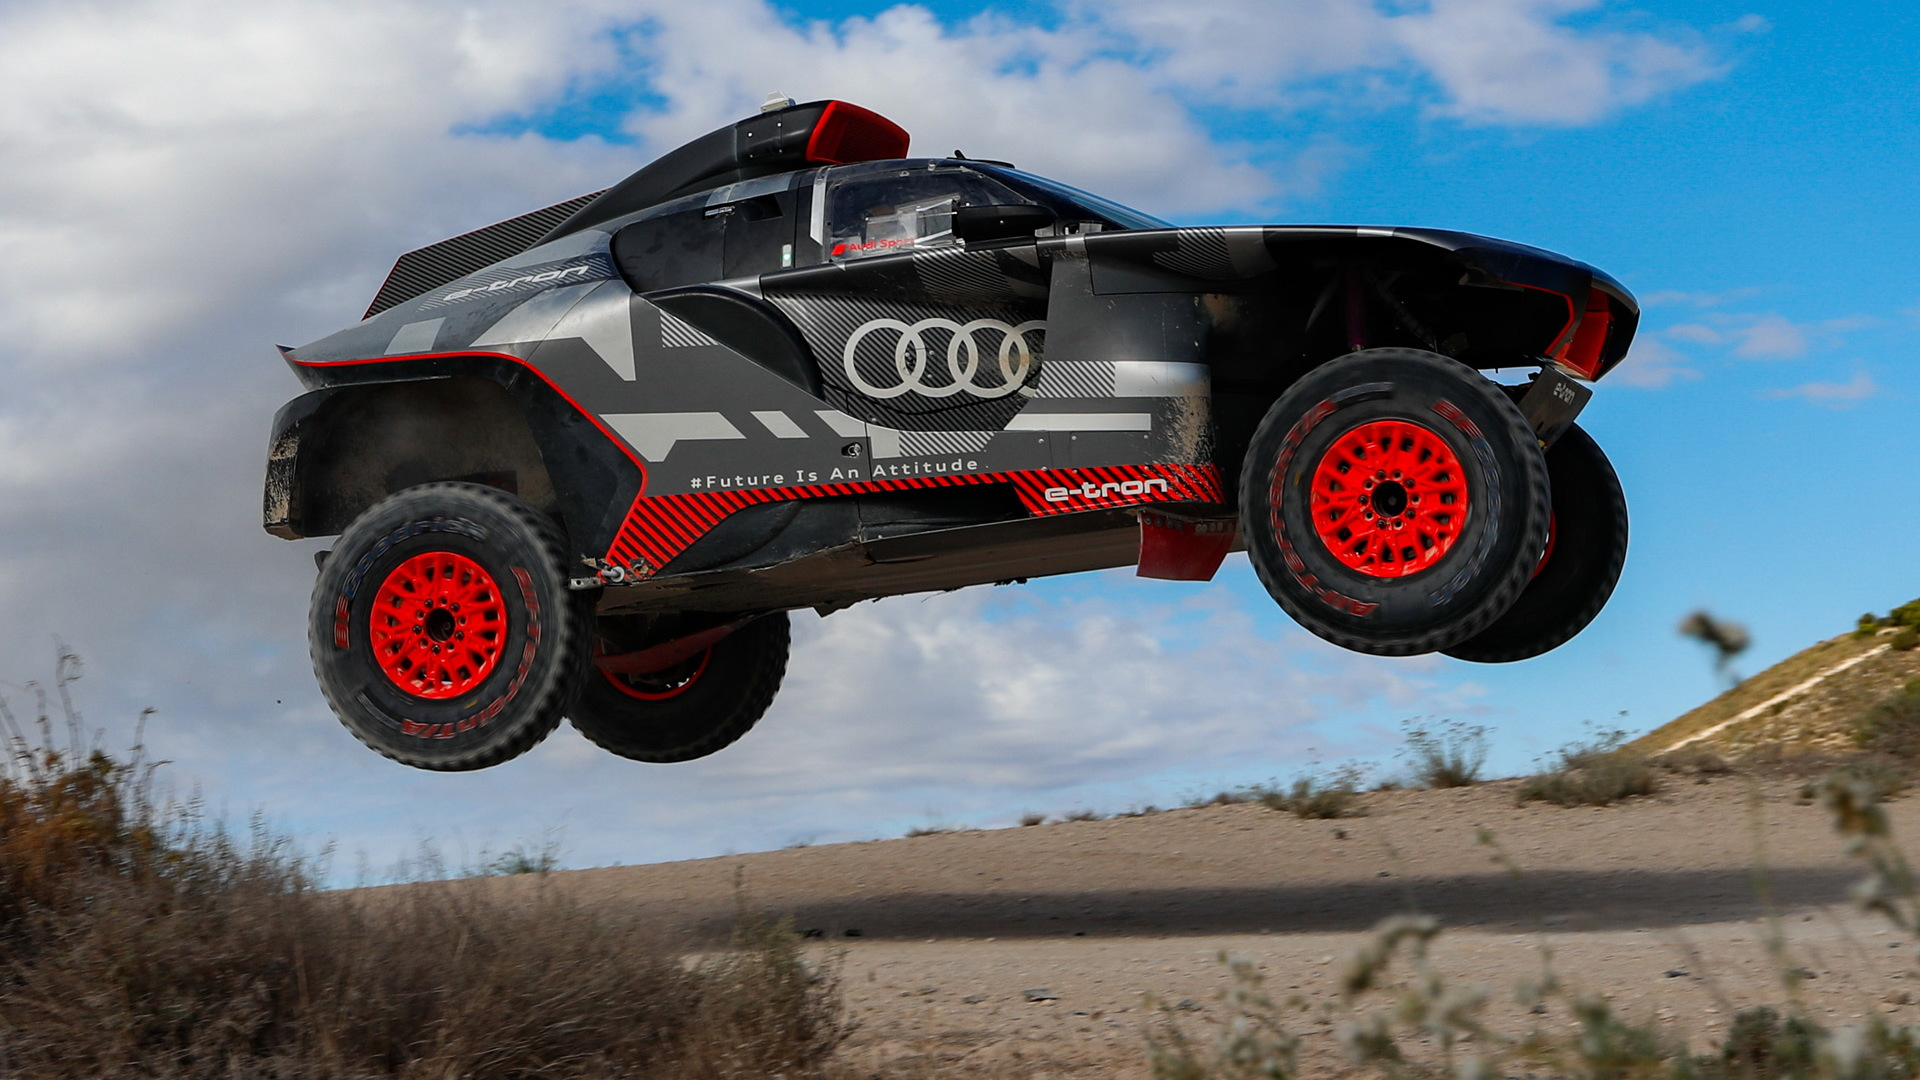 Audi RS Q E-Tron hot-weather testing near Zaragoza, Spain - August 2021